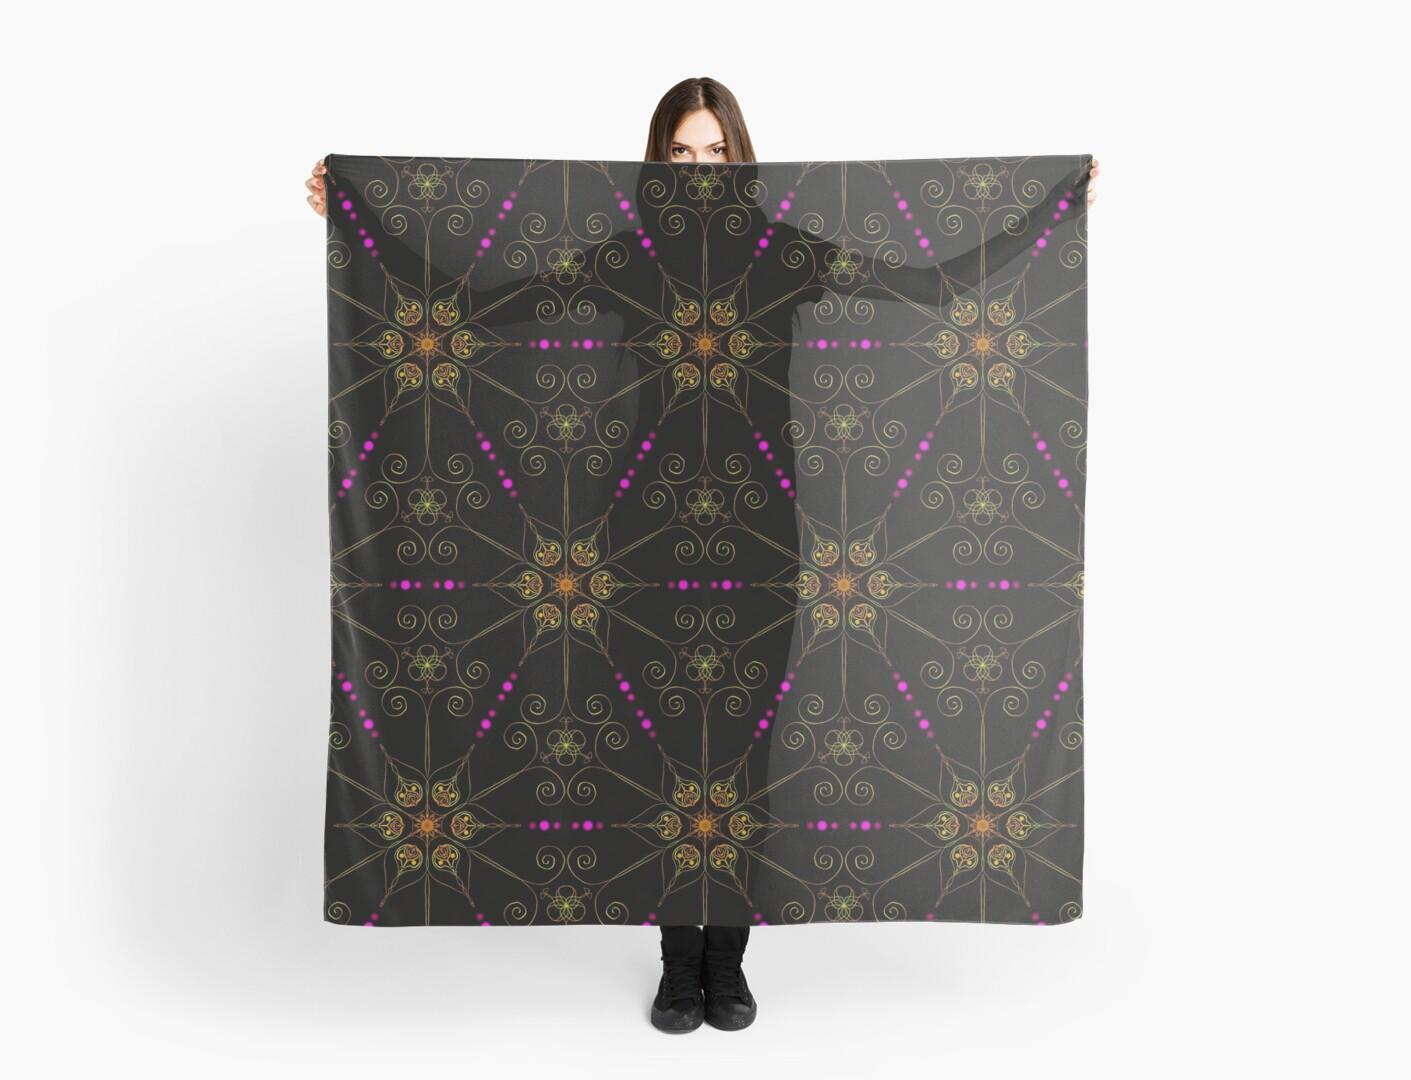 a5085d40c4ea 'Psychedelic Pattern, Ornament, Mandala, Design, Art, Flower, Fantasy,  Magic, Geometry, ' Scarf by lavalova